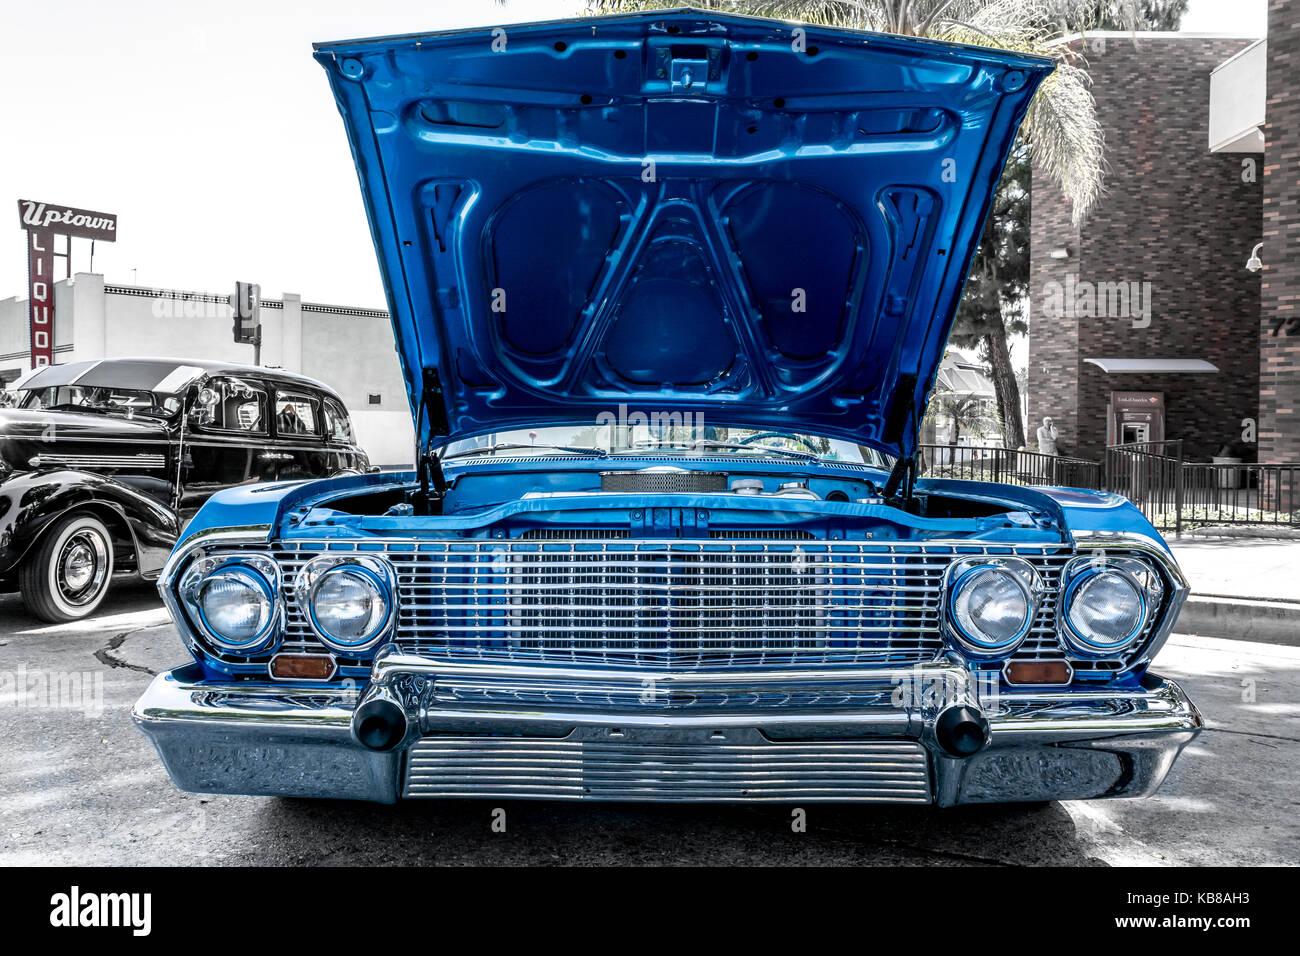 Uptown Car Show Gig Harbor